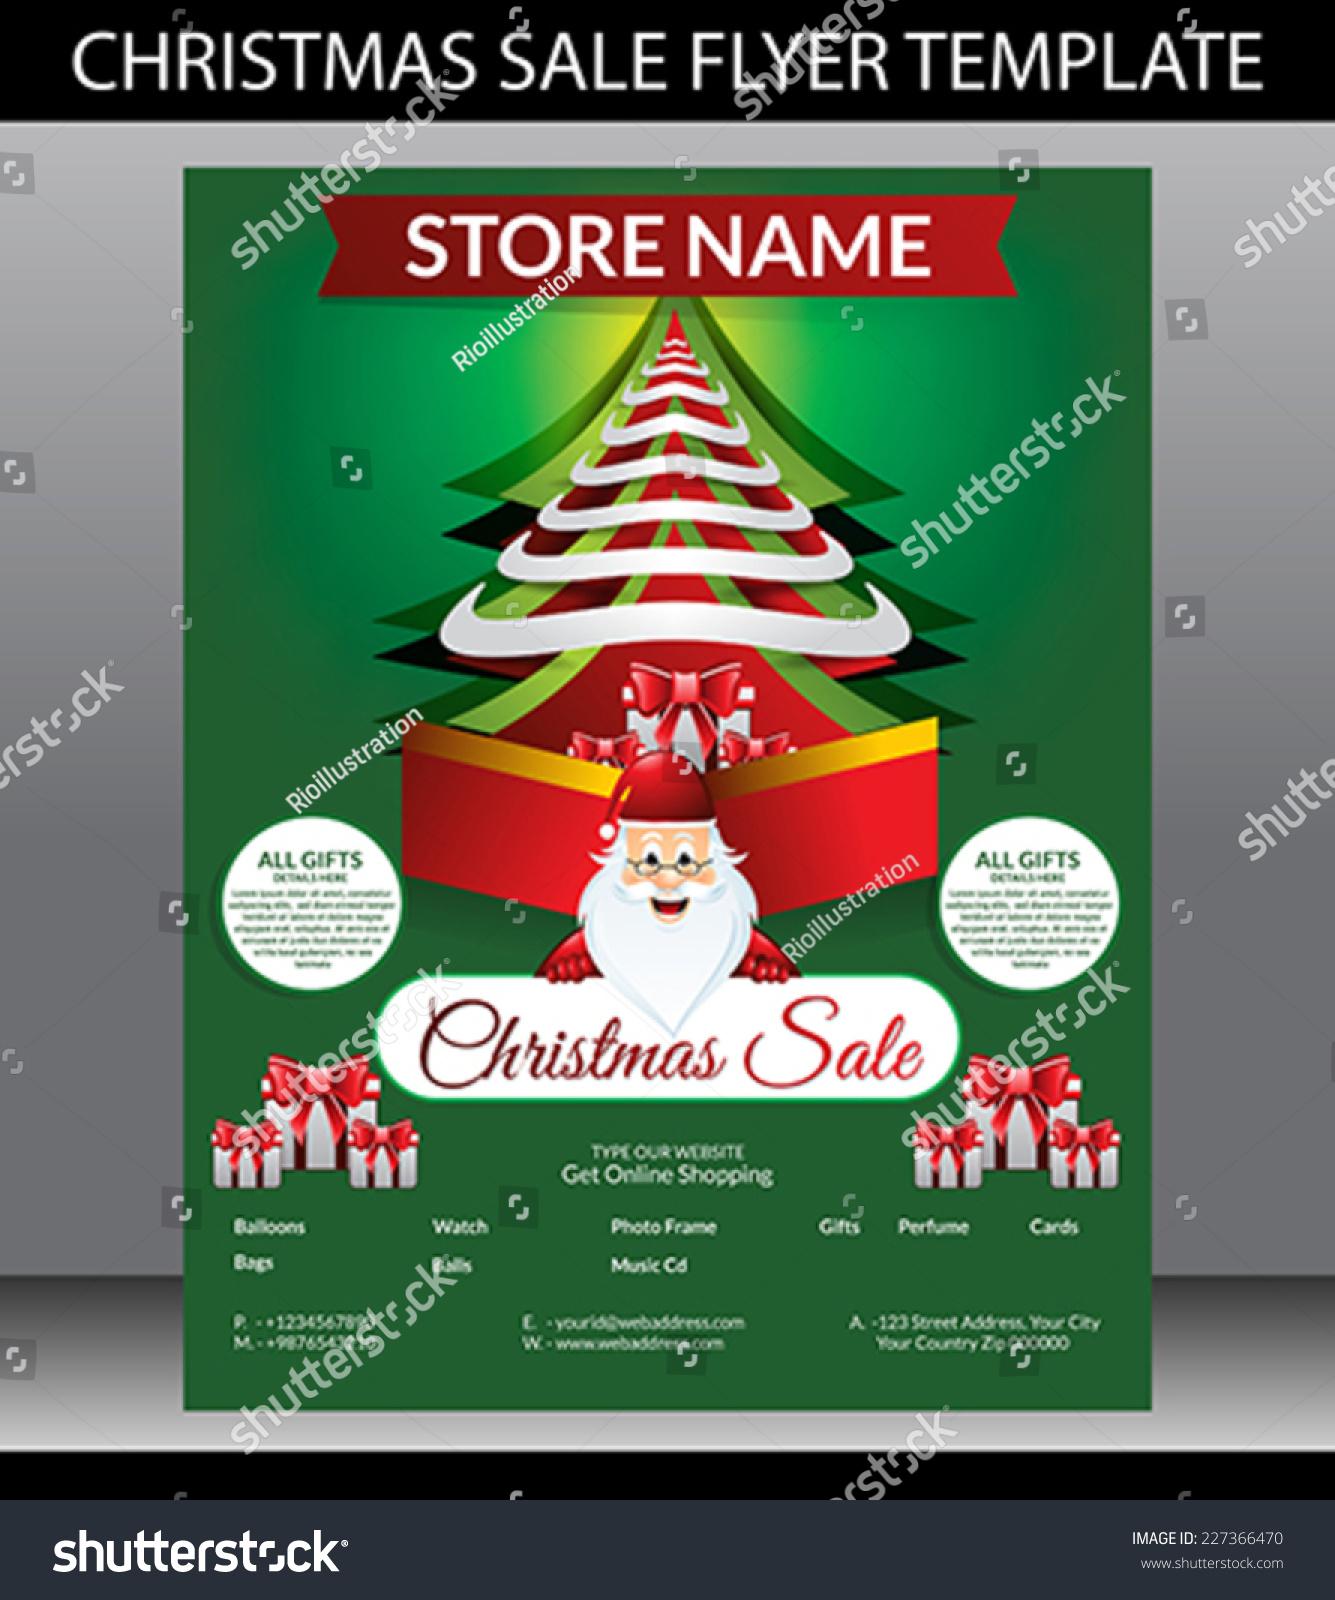 christmas sale flyer template